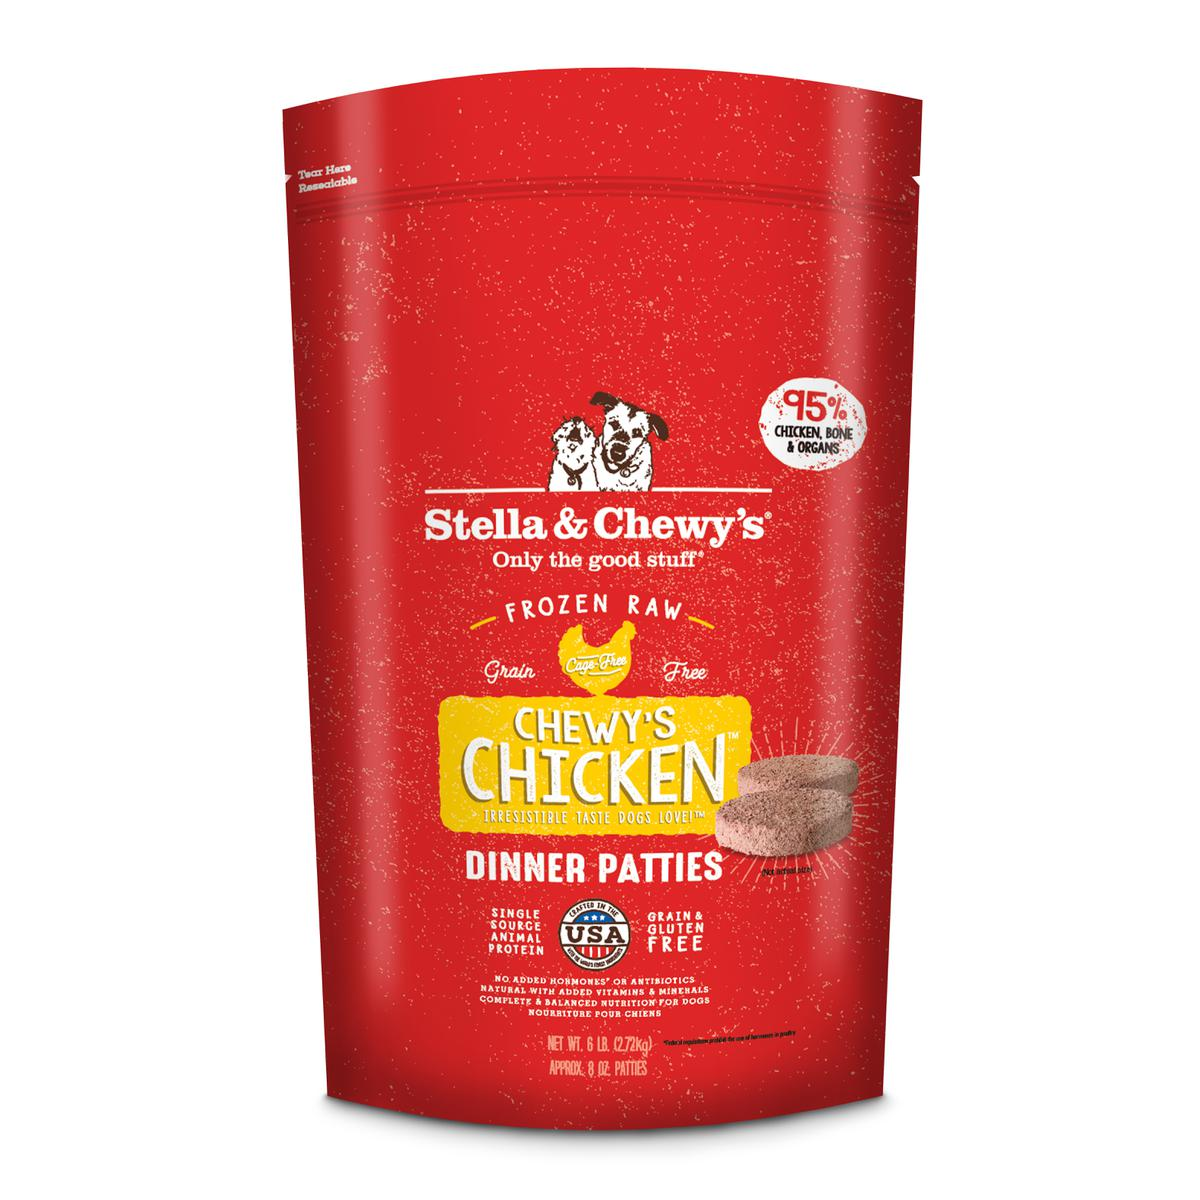 Stella & Chewy's Chewy's Chicken 8-oz Dinner Patties Grain-Free Raw Frozen Dog Food, 6-lb